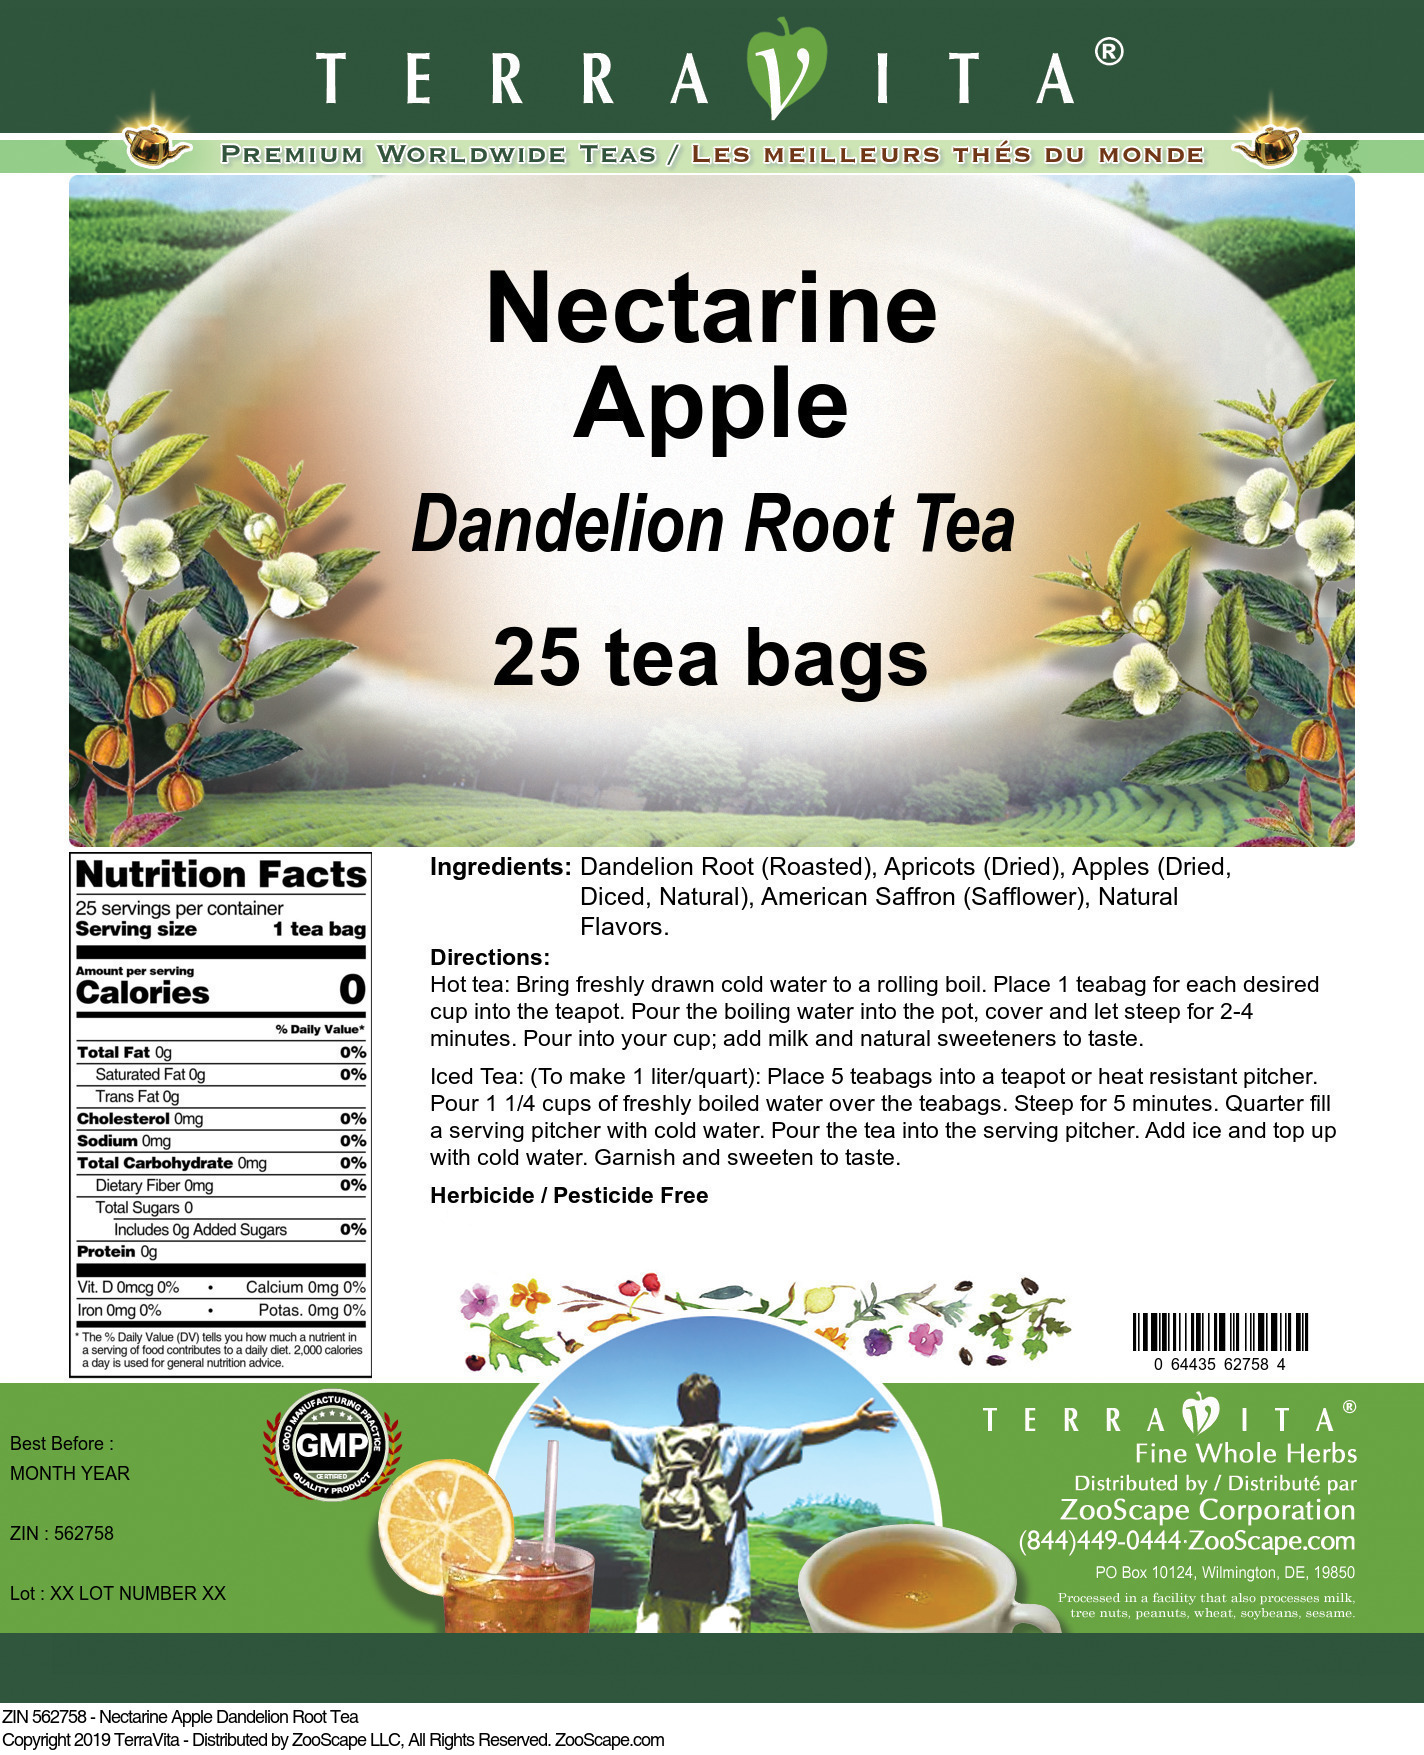 Nectarine Apple Dandelion Root